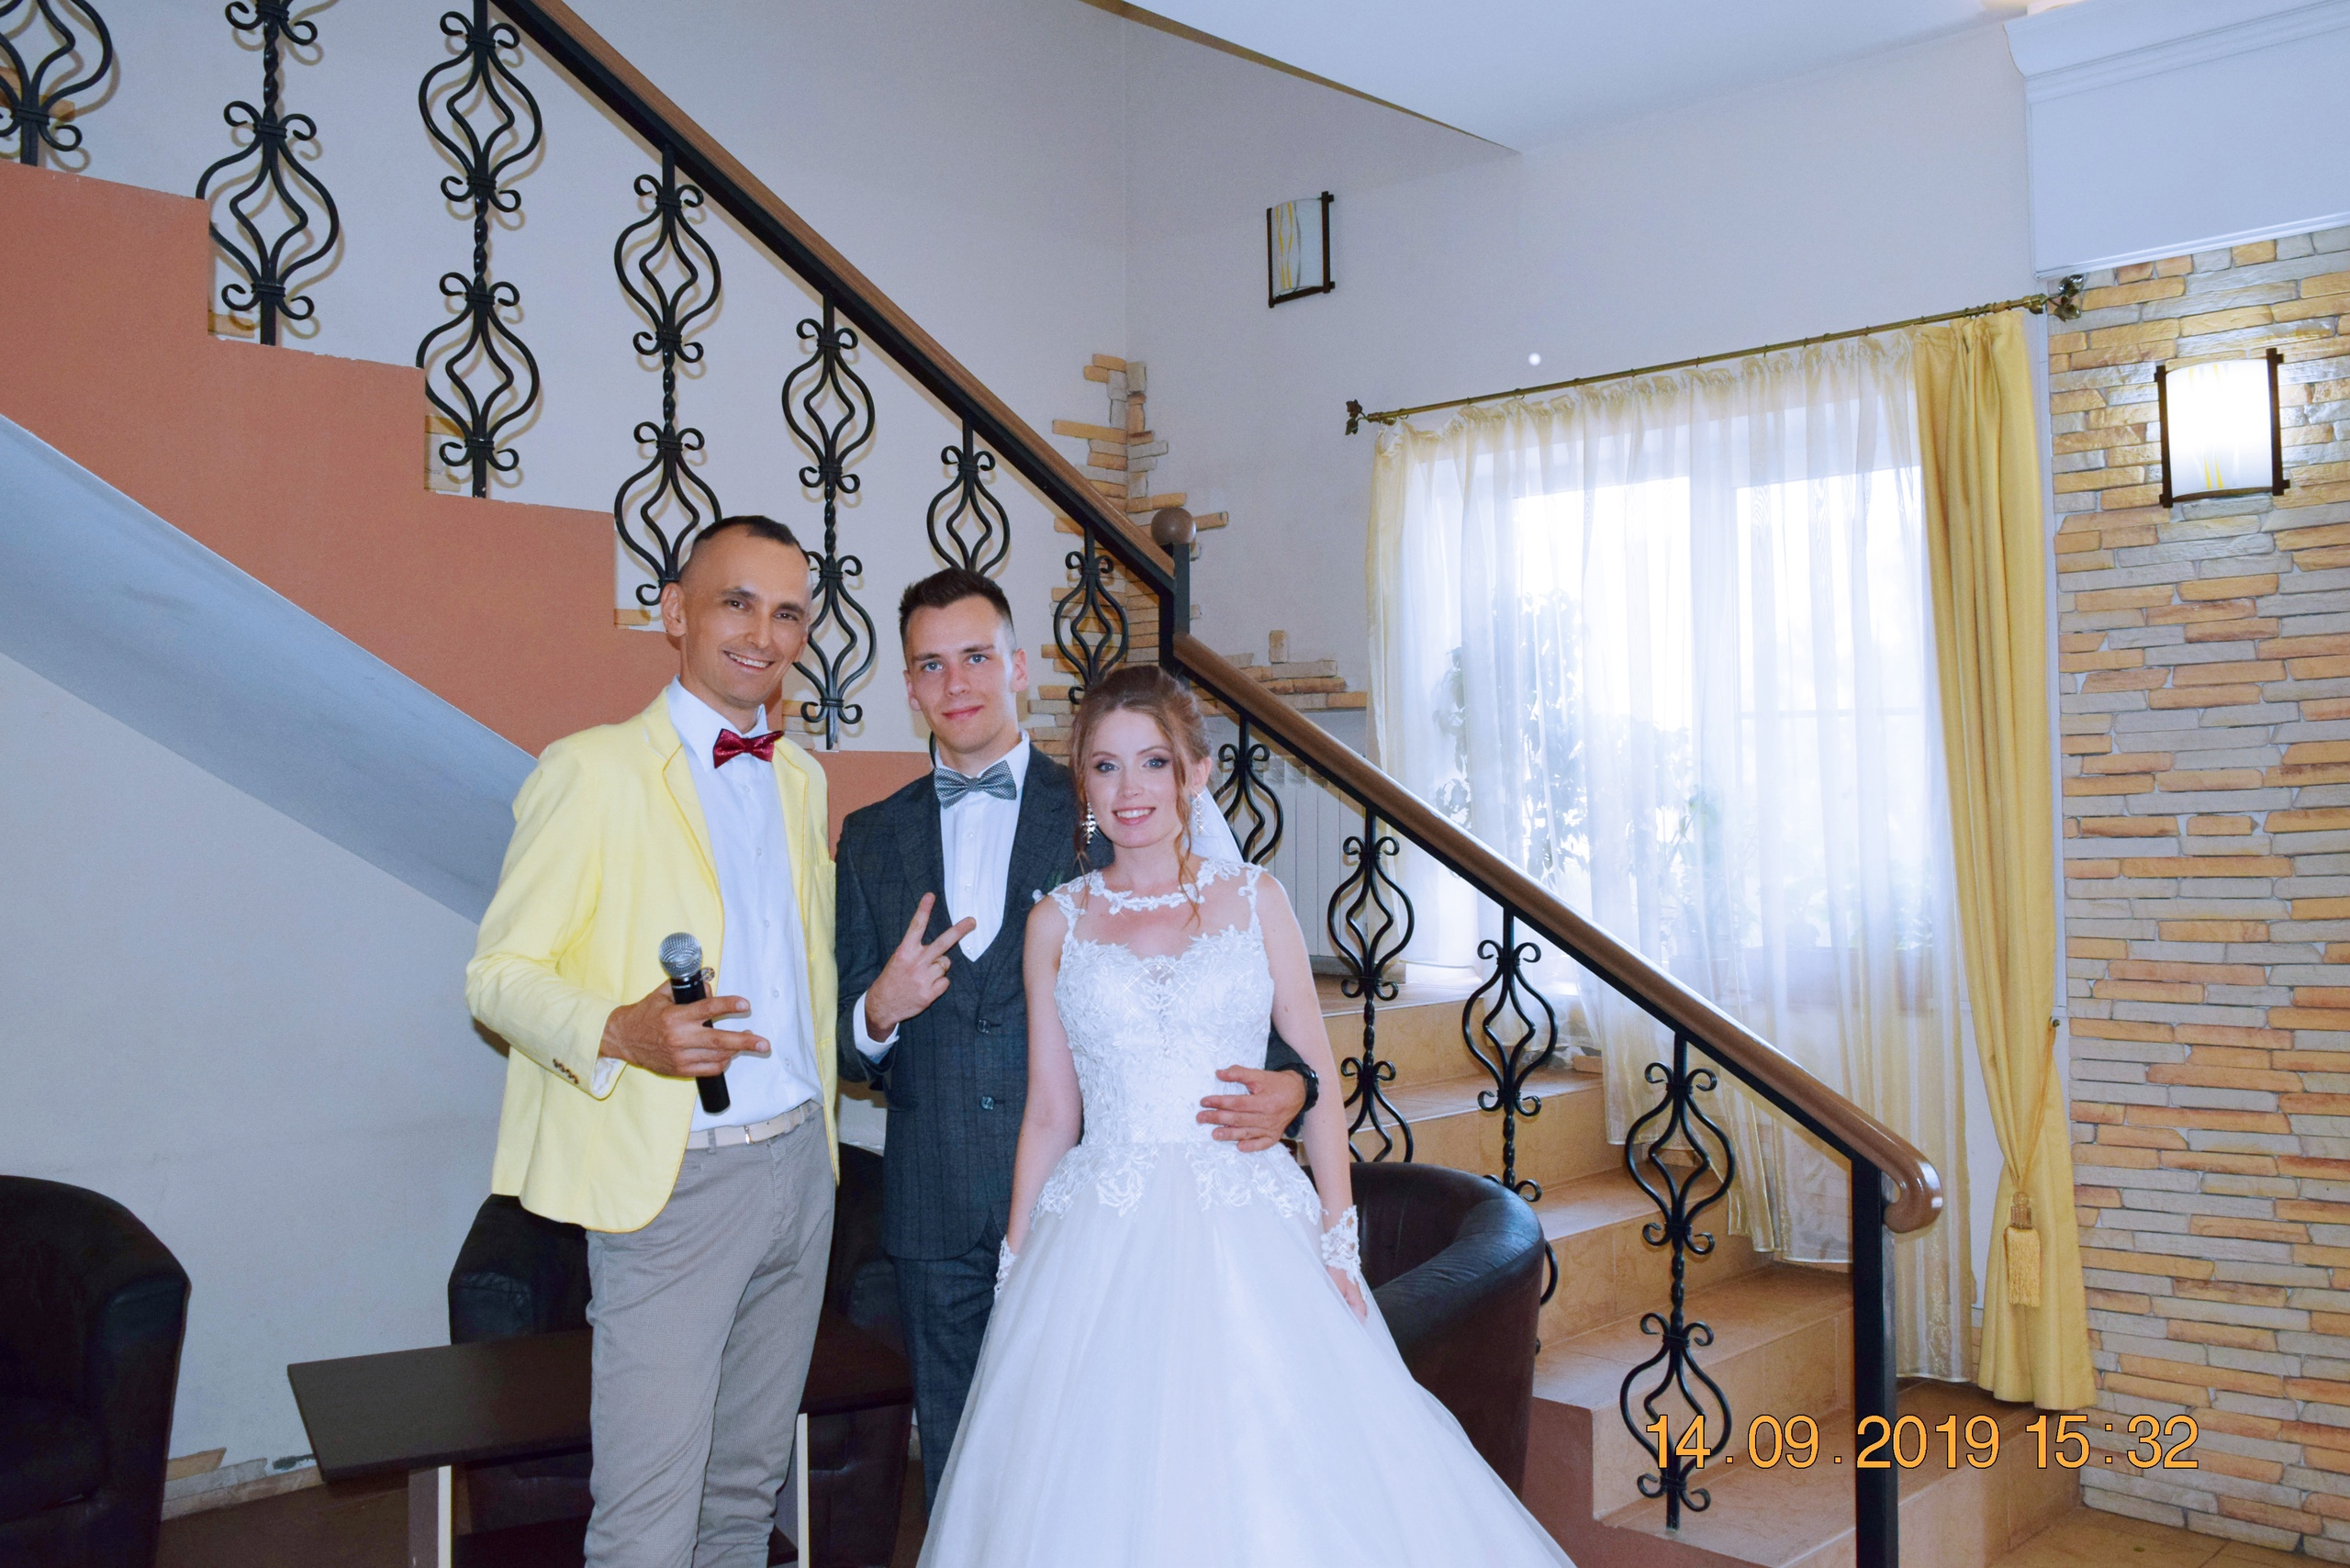 vlHdru4lARk - Свадьба Евгения и Веры